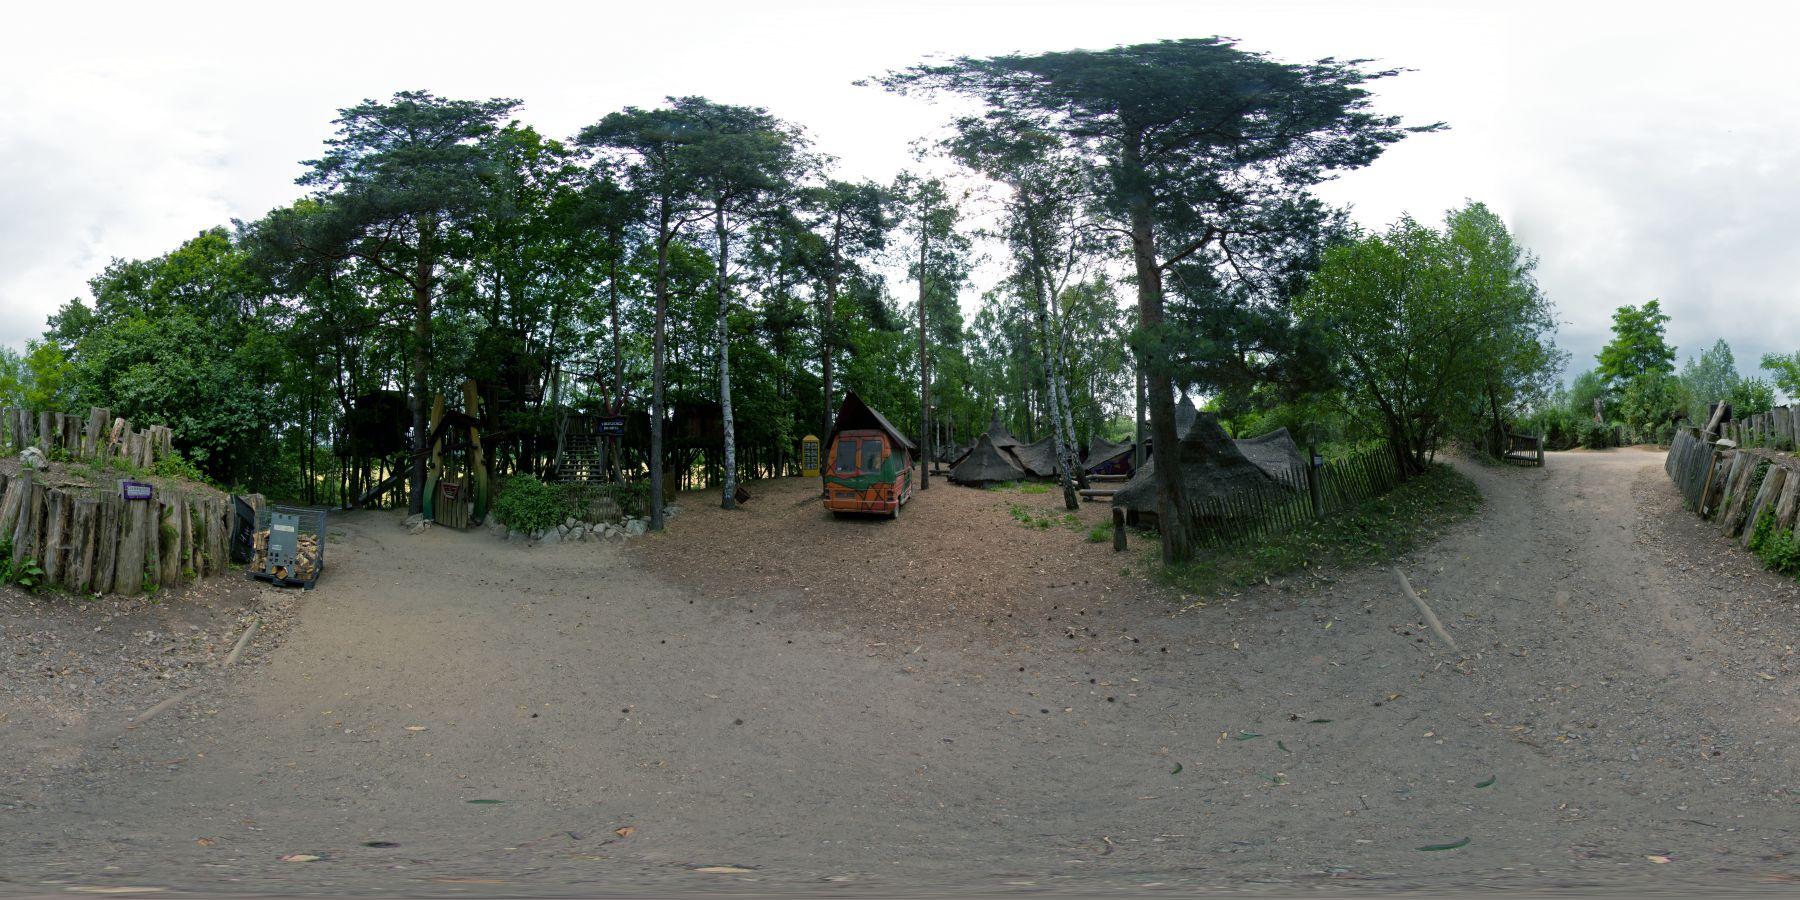 Kulturinsel Einsiedel 4